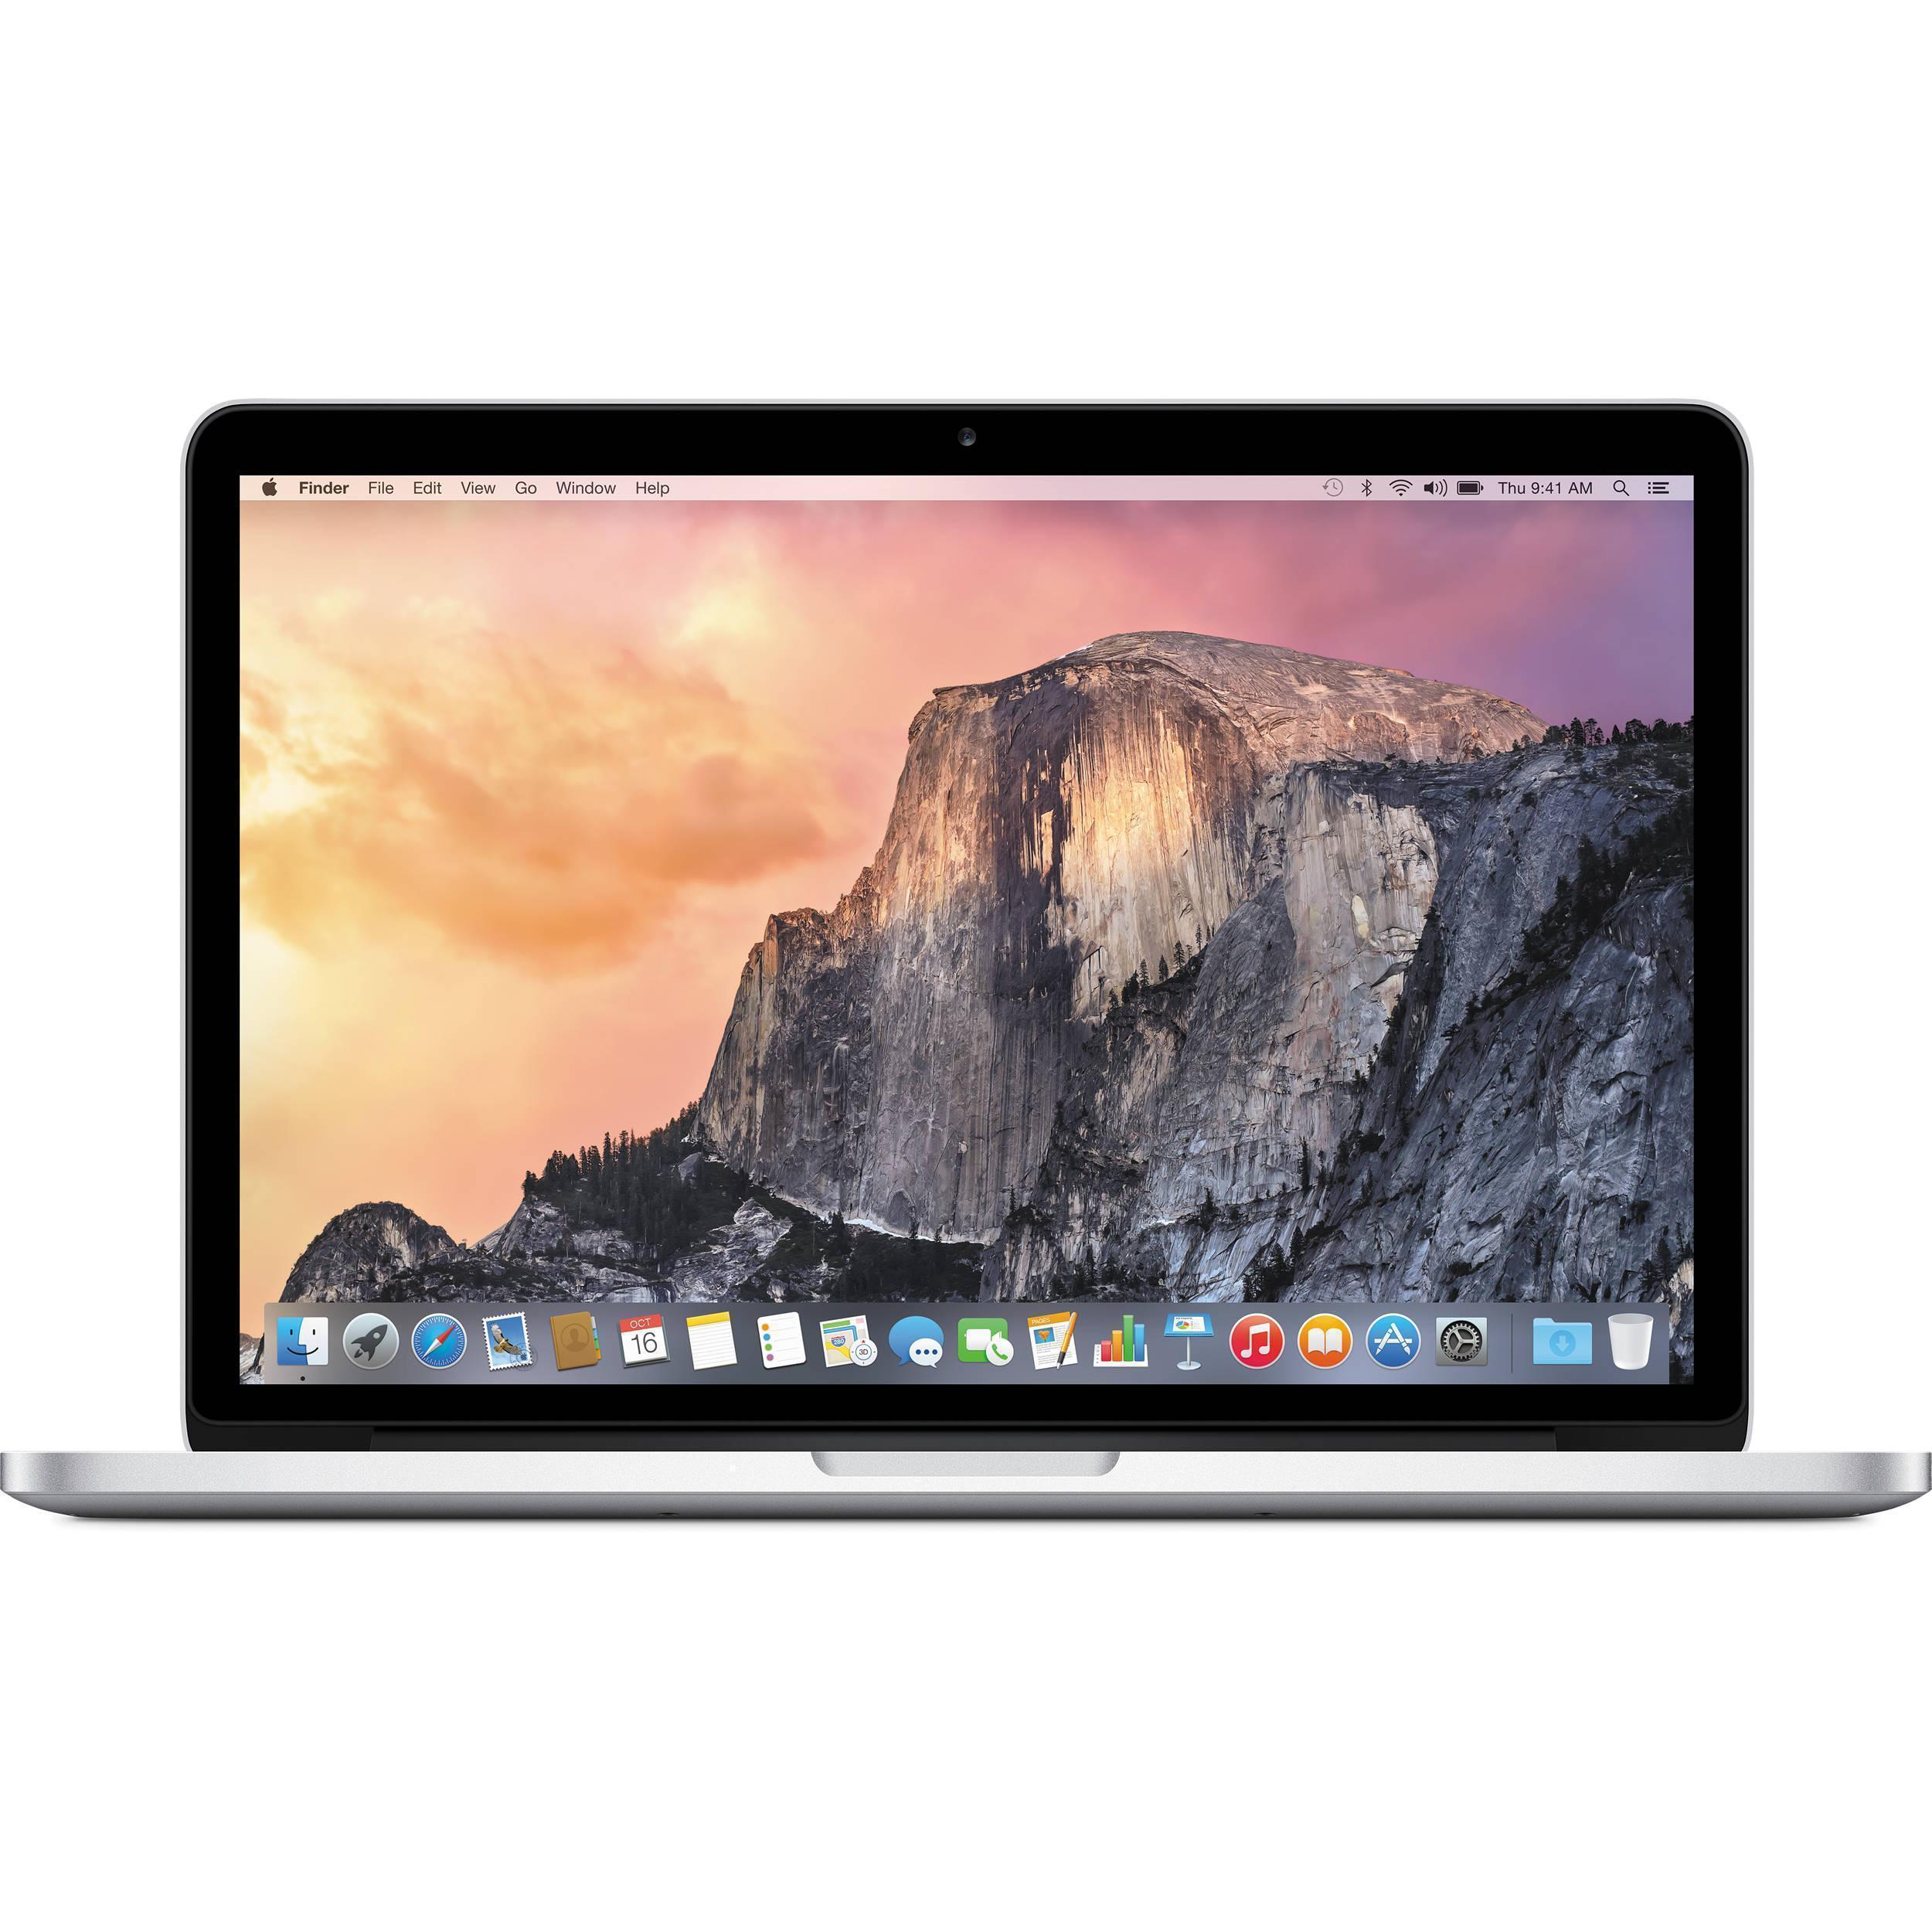 "MacBook Pro 13"" Retina (2015) - Core i5 2,7 GHz - SSD 256 GB - 8GB - QWERTY - Russisch"